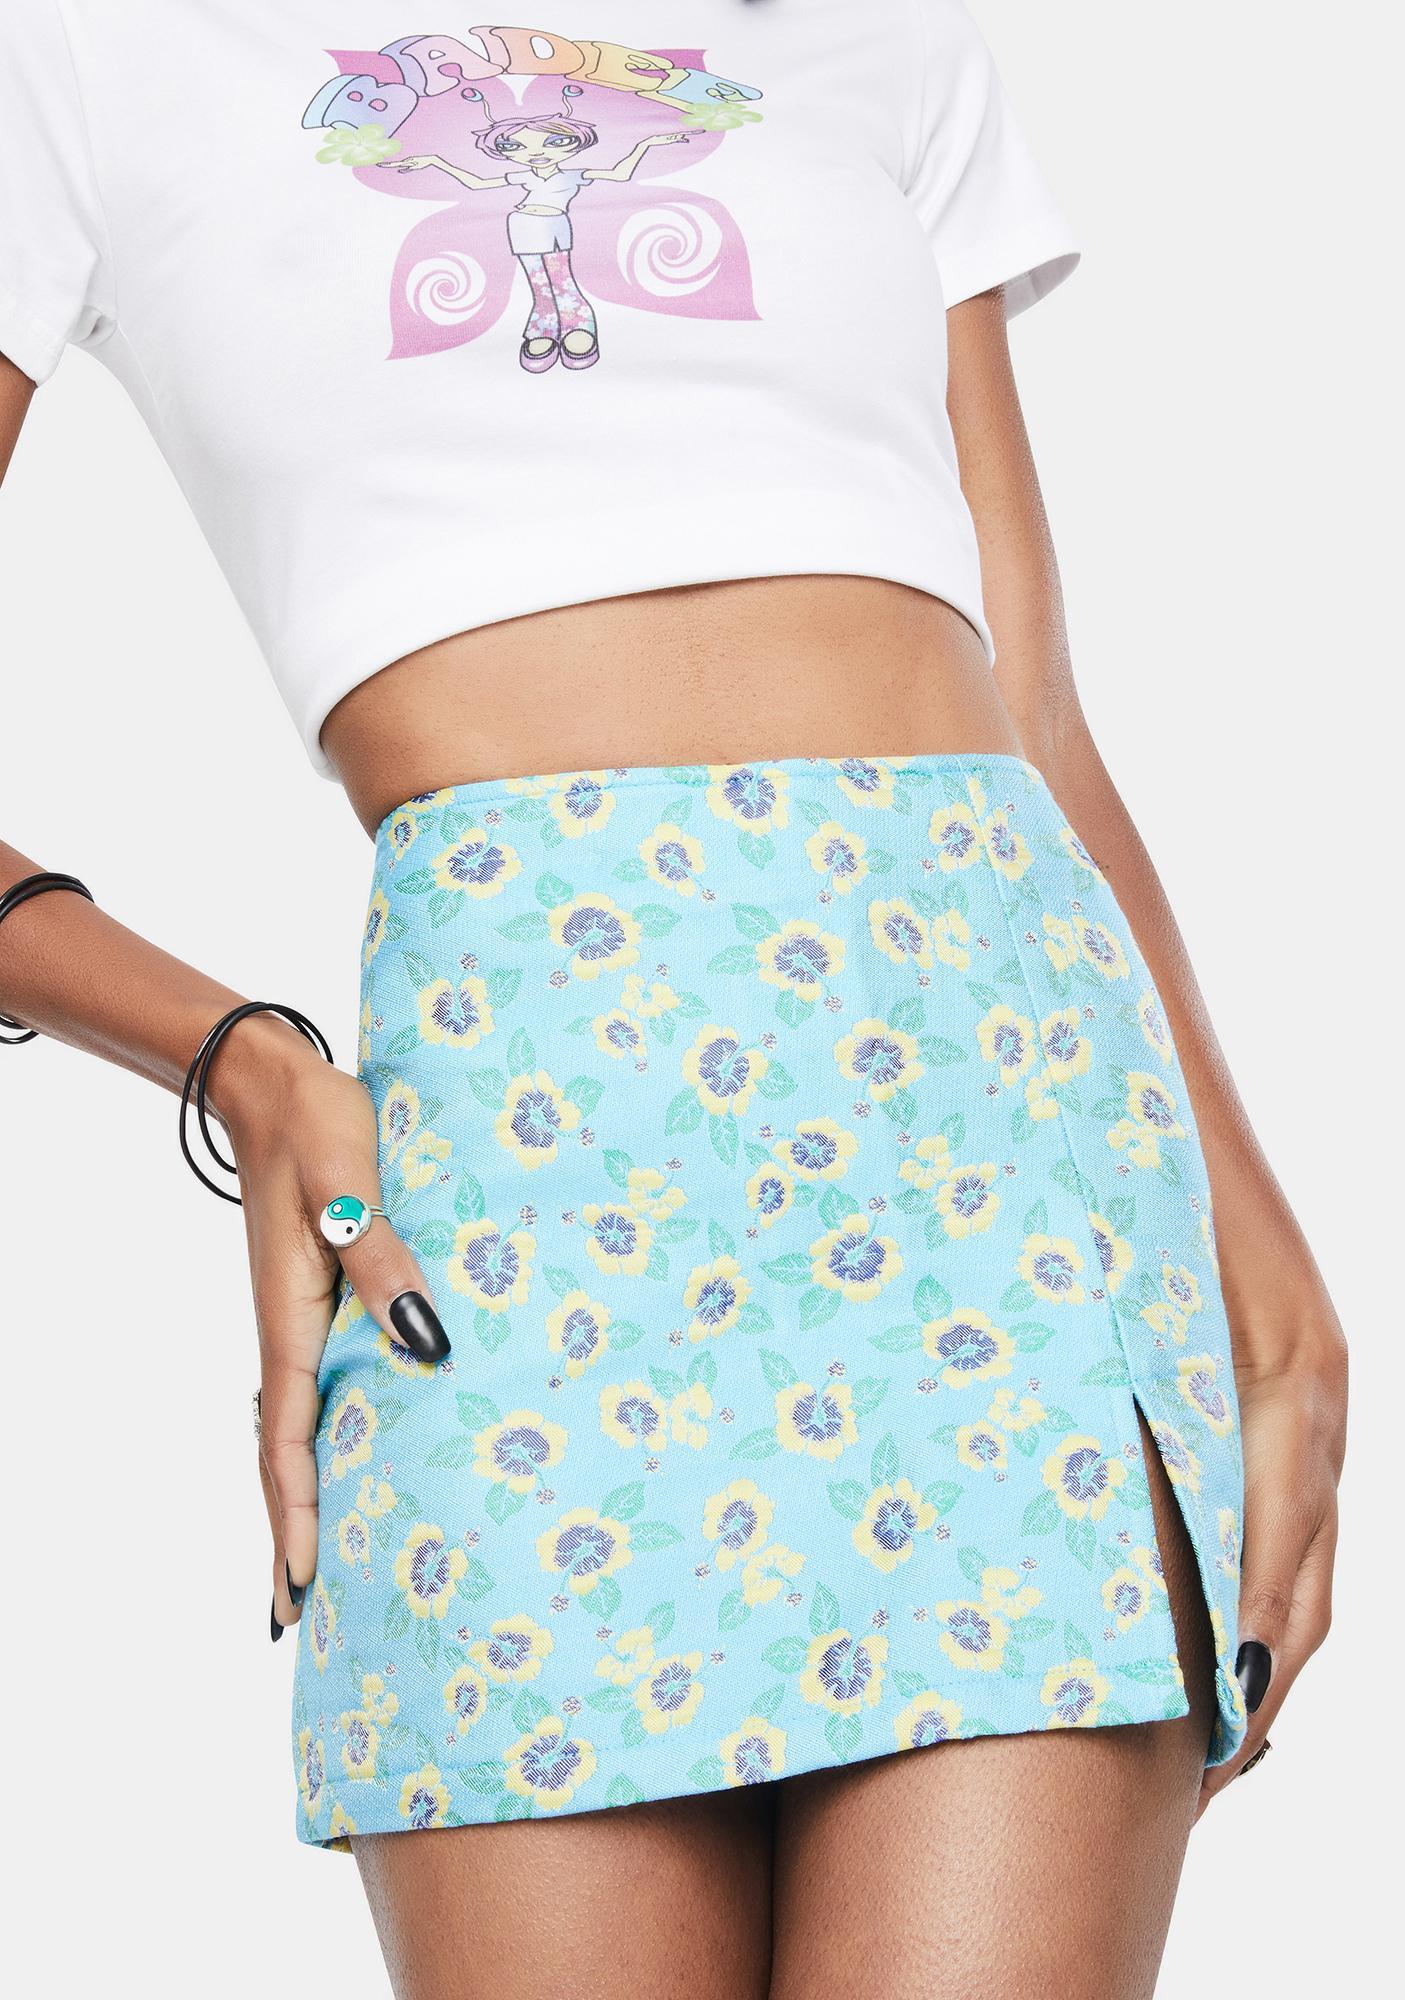 BADEE Flower Jacquard Mini Skirt